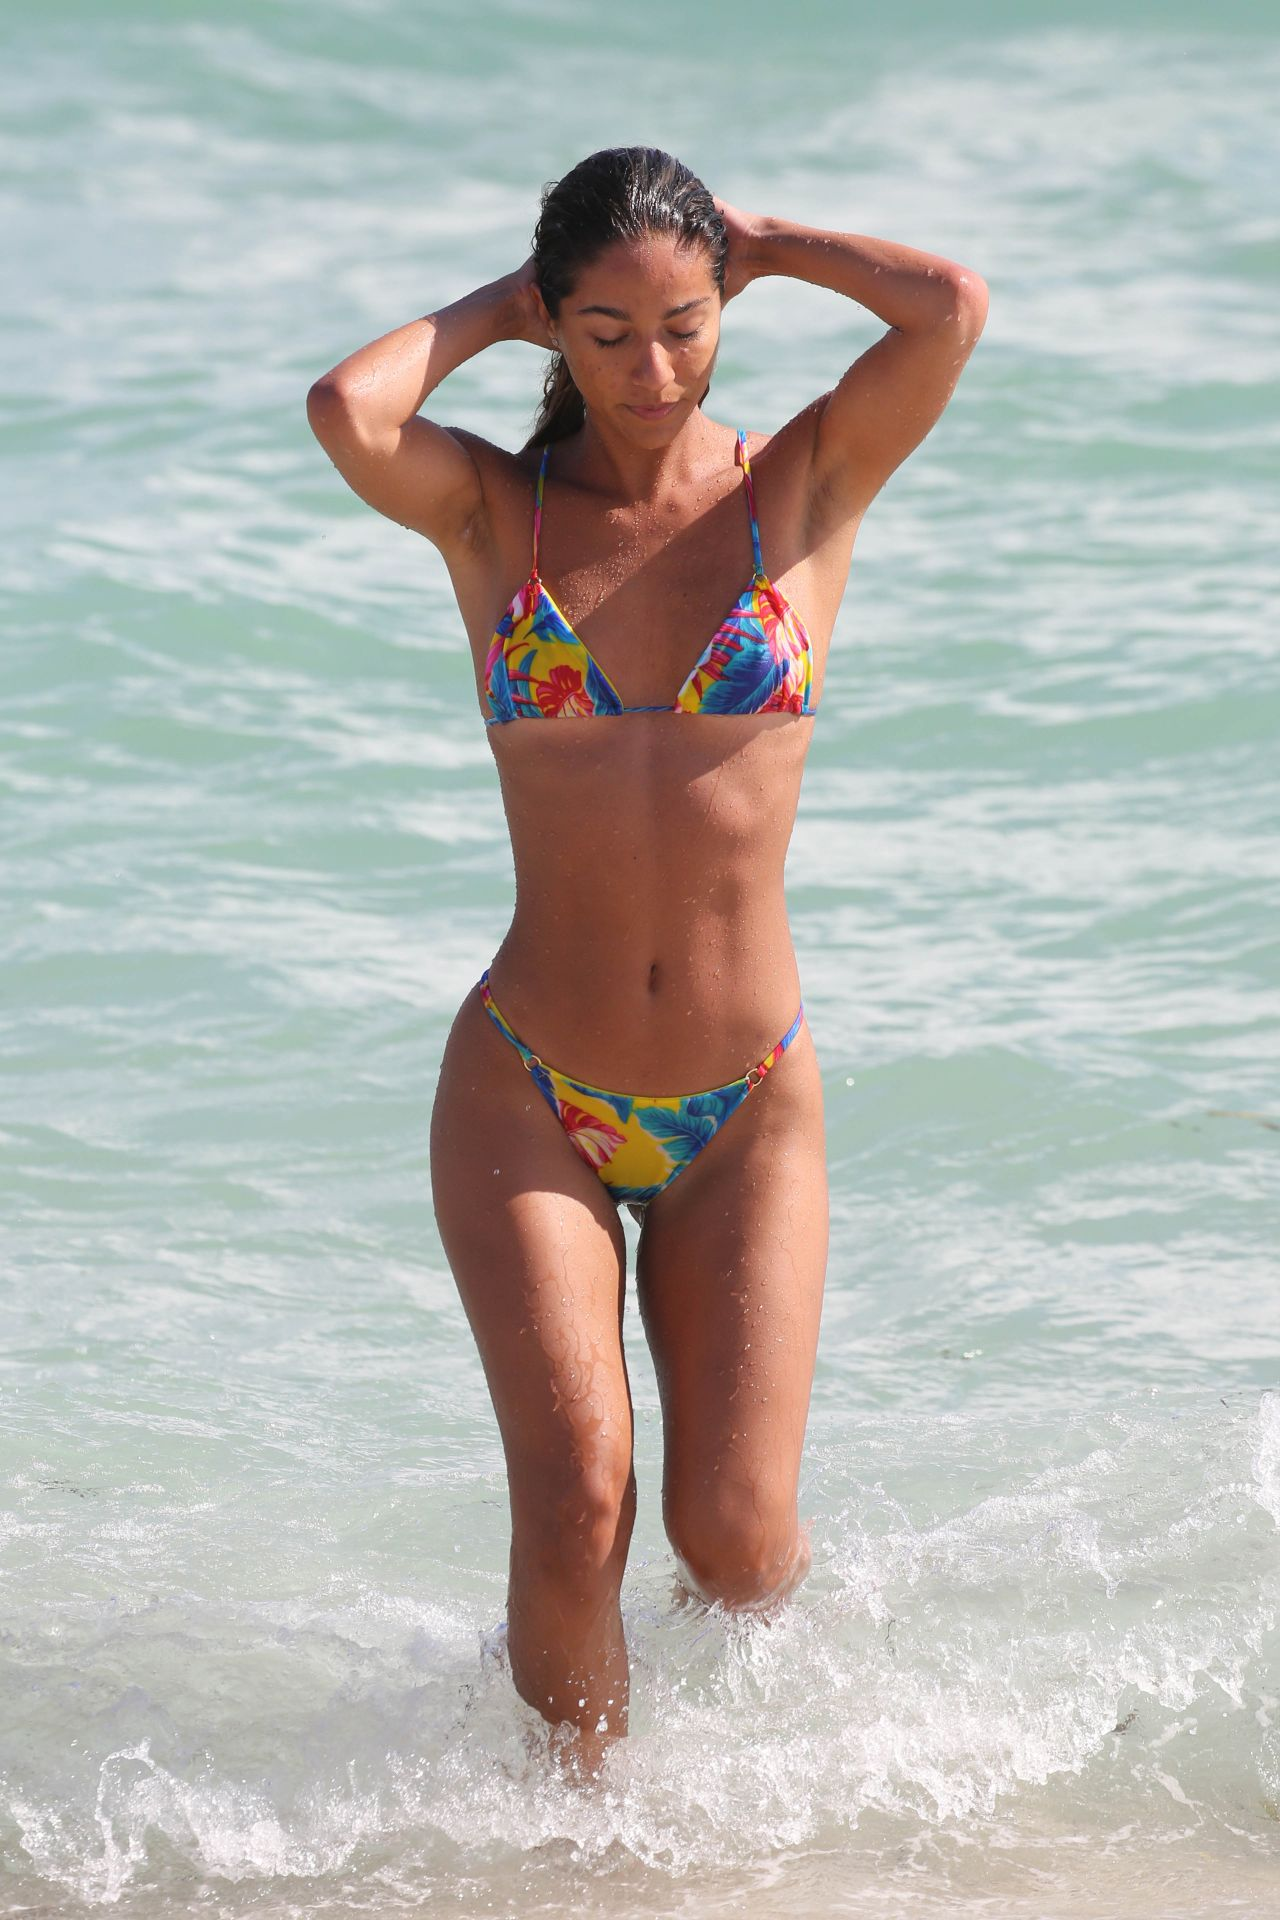 Celebrites Erika Wheaton nude (77 foto and video), Sexy, Paparazzi, Instagram, cleavage 2020